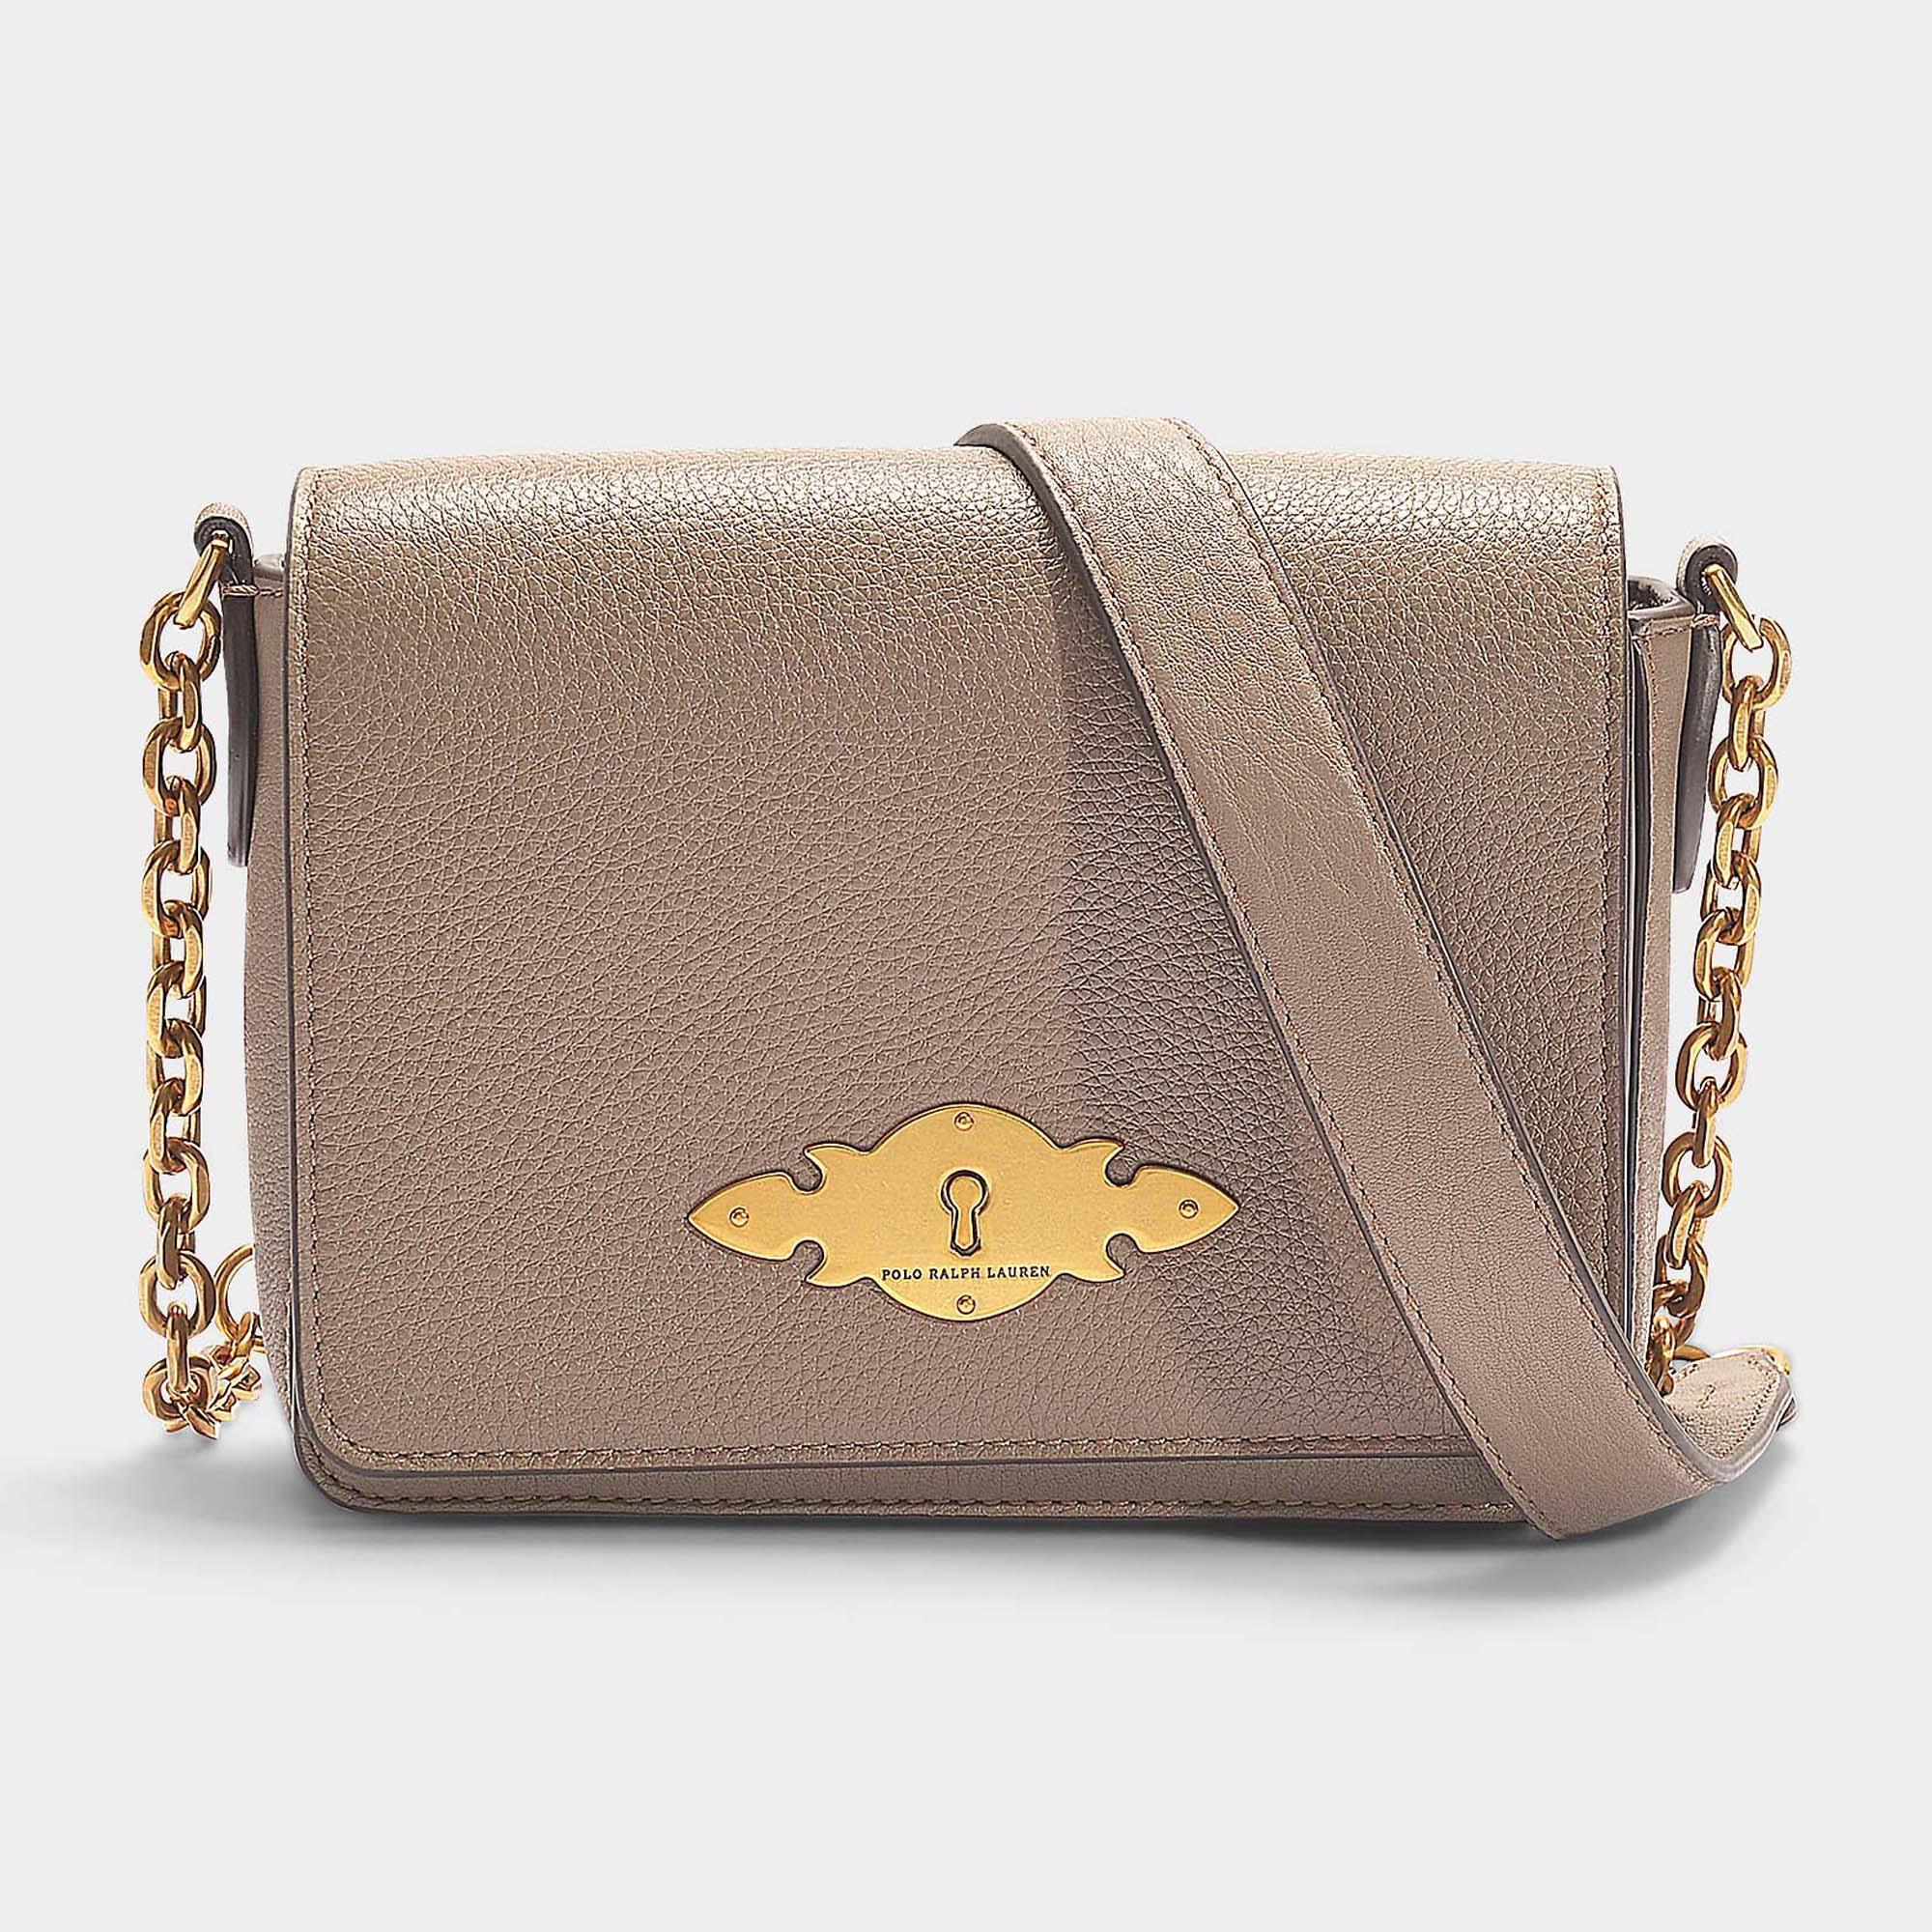 Polo Ralph Lauren Brooke Chain Small Crossbody Bag In Taupe Calfskin ... 970aeac9cb